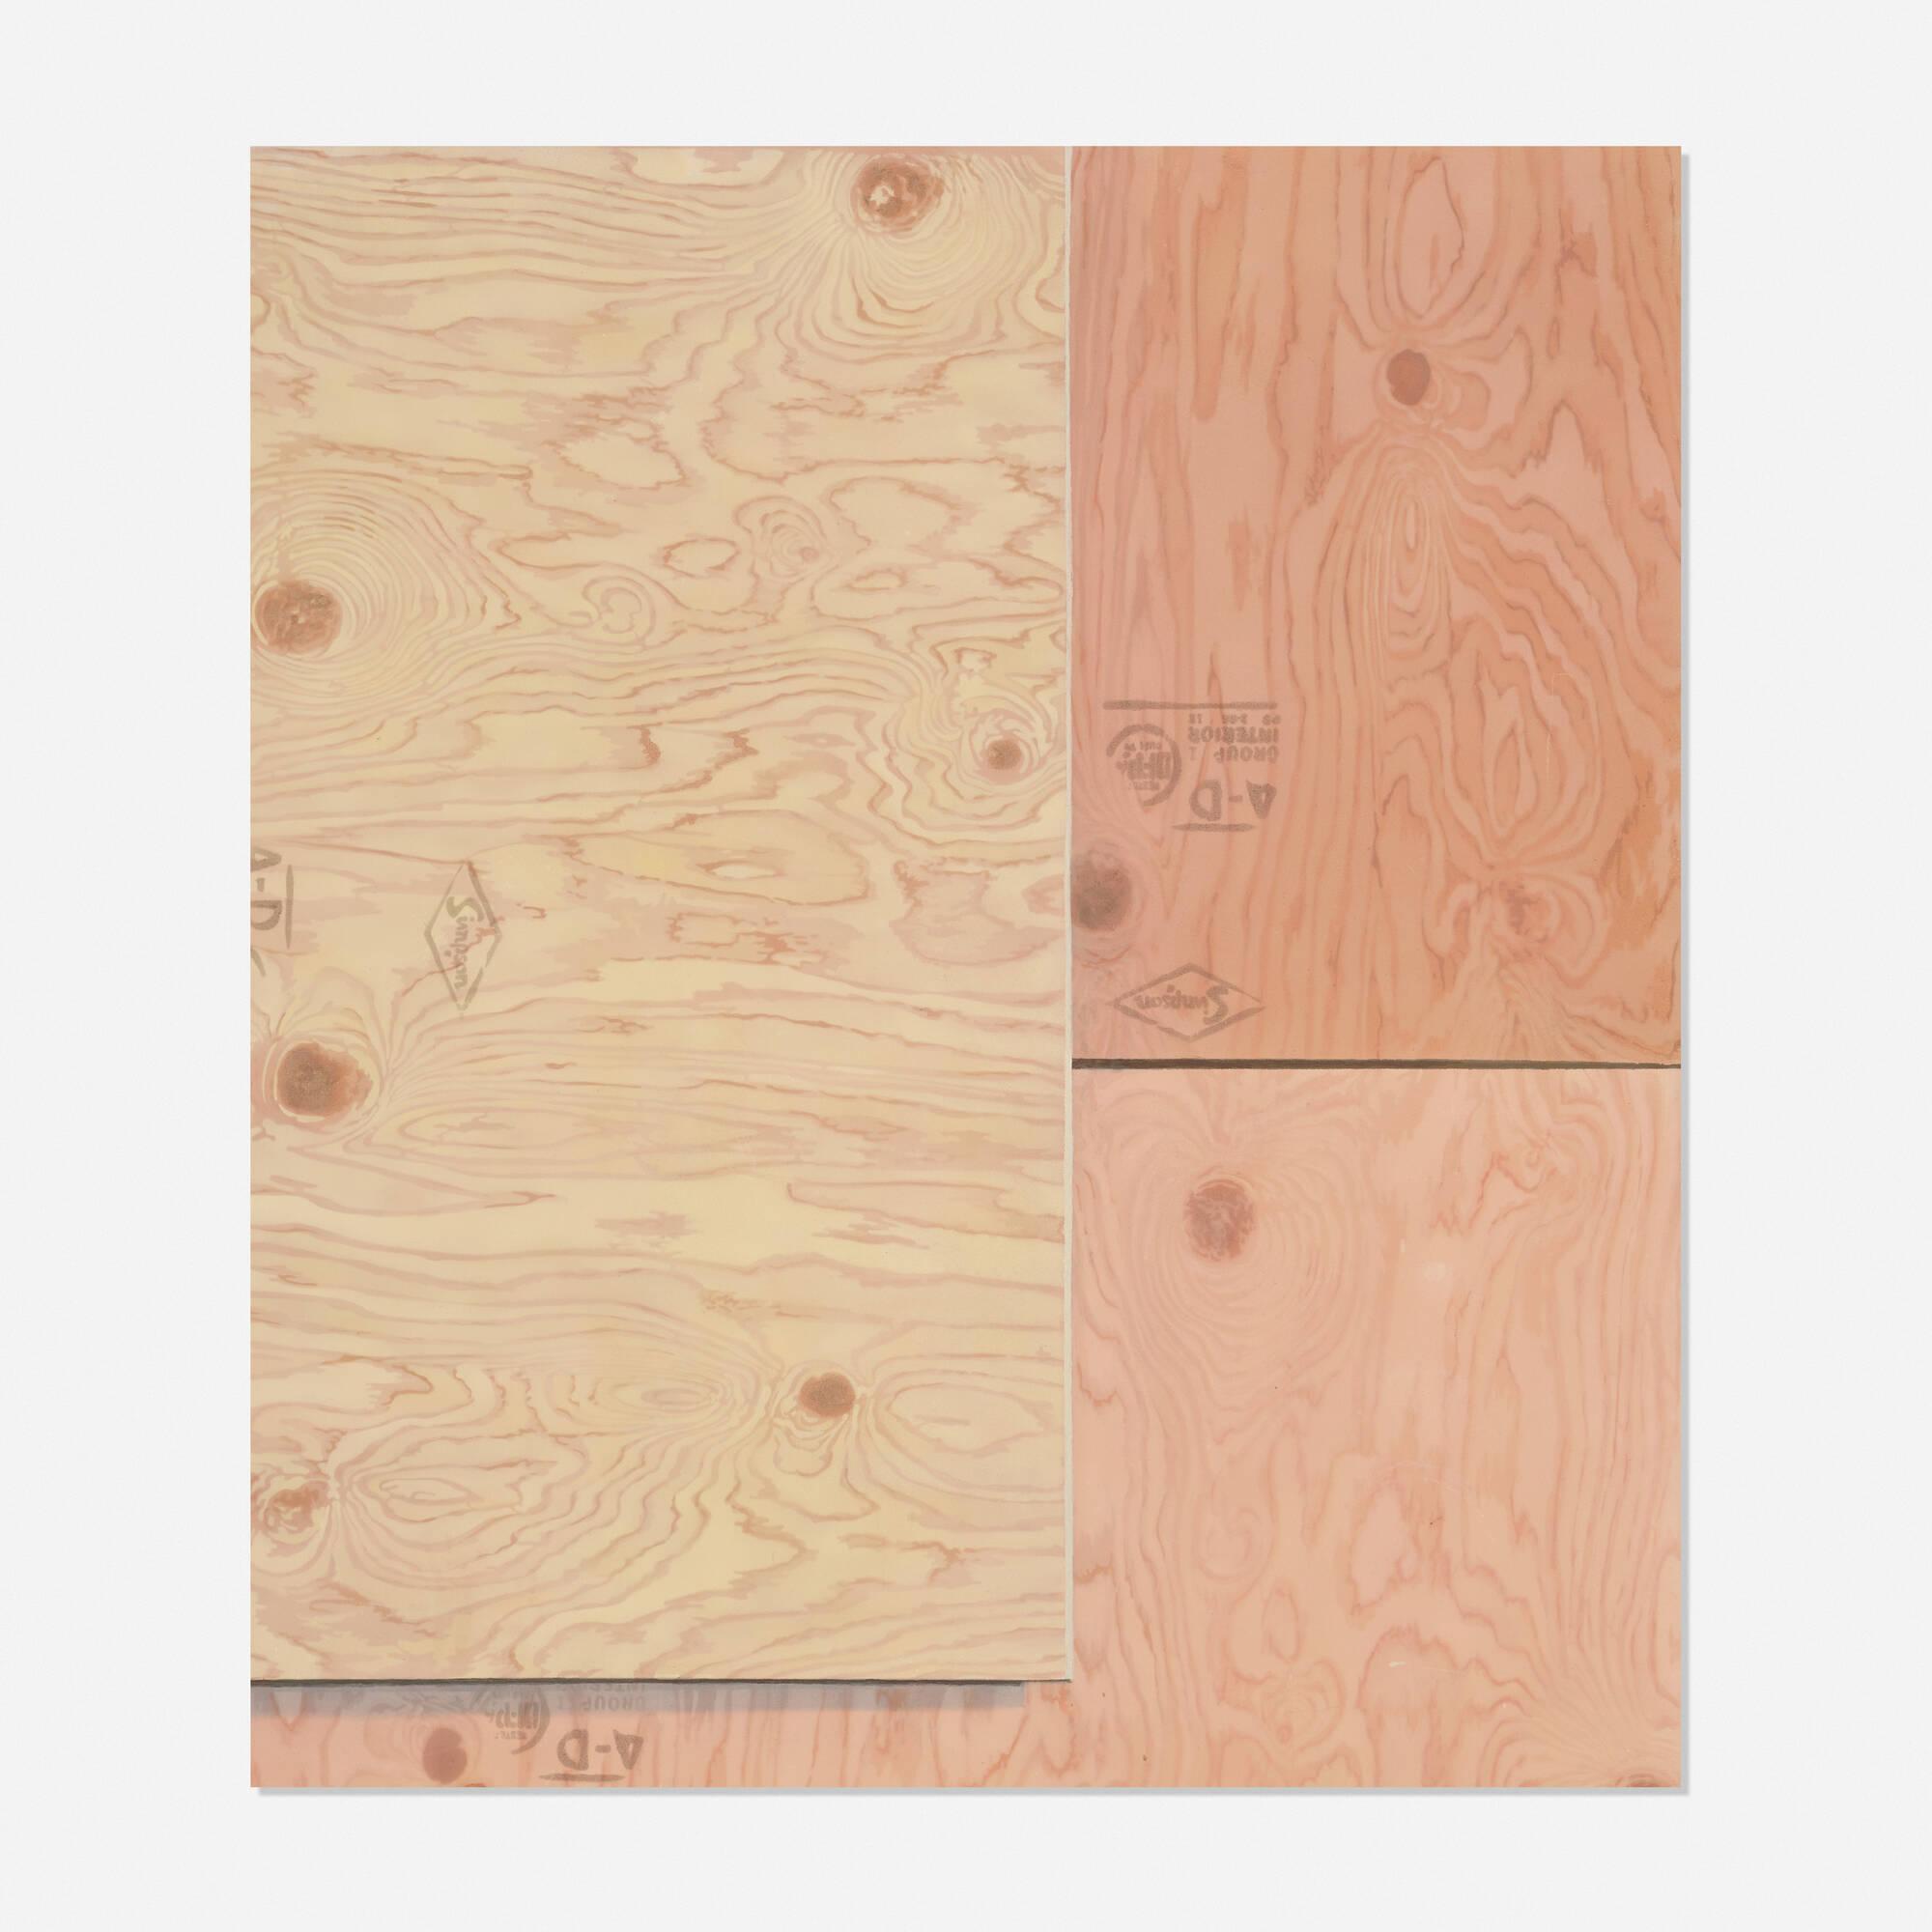 248: John Clem Clarke / Plywood (1 of 2)